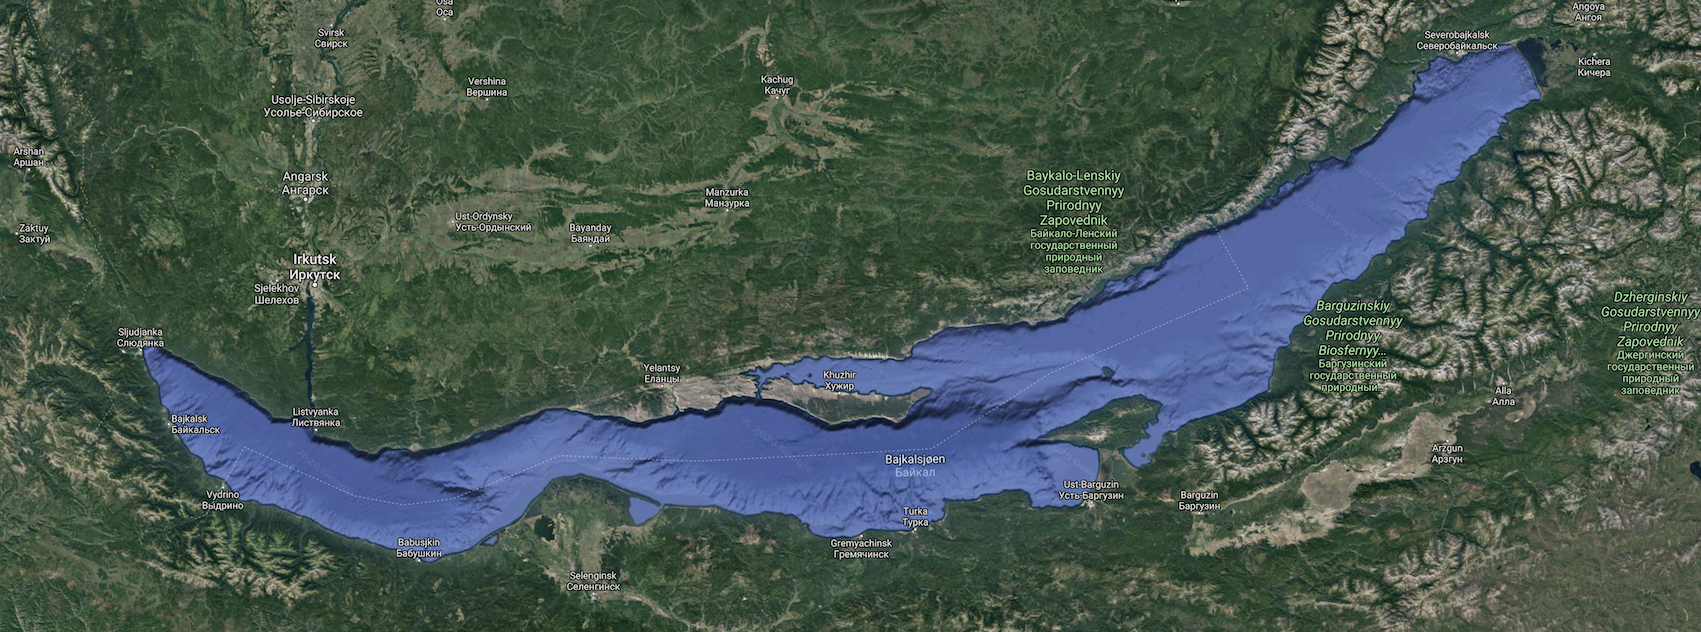 Bajkalsjøen, verdens dypeste innsjø / Lake Baikal